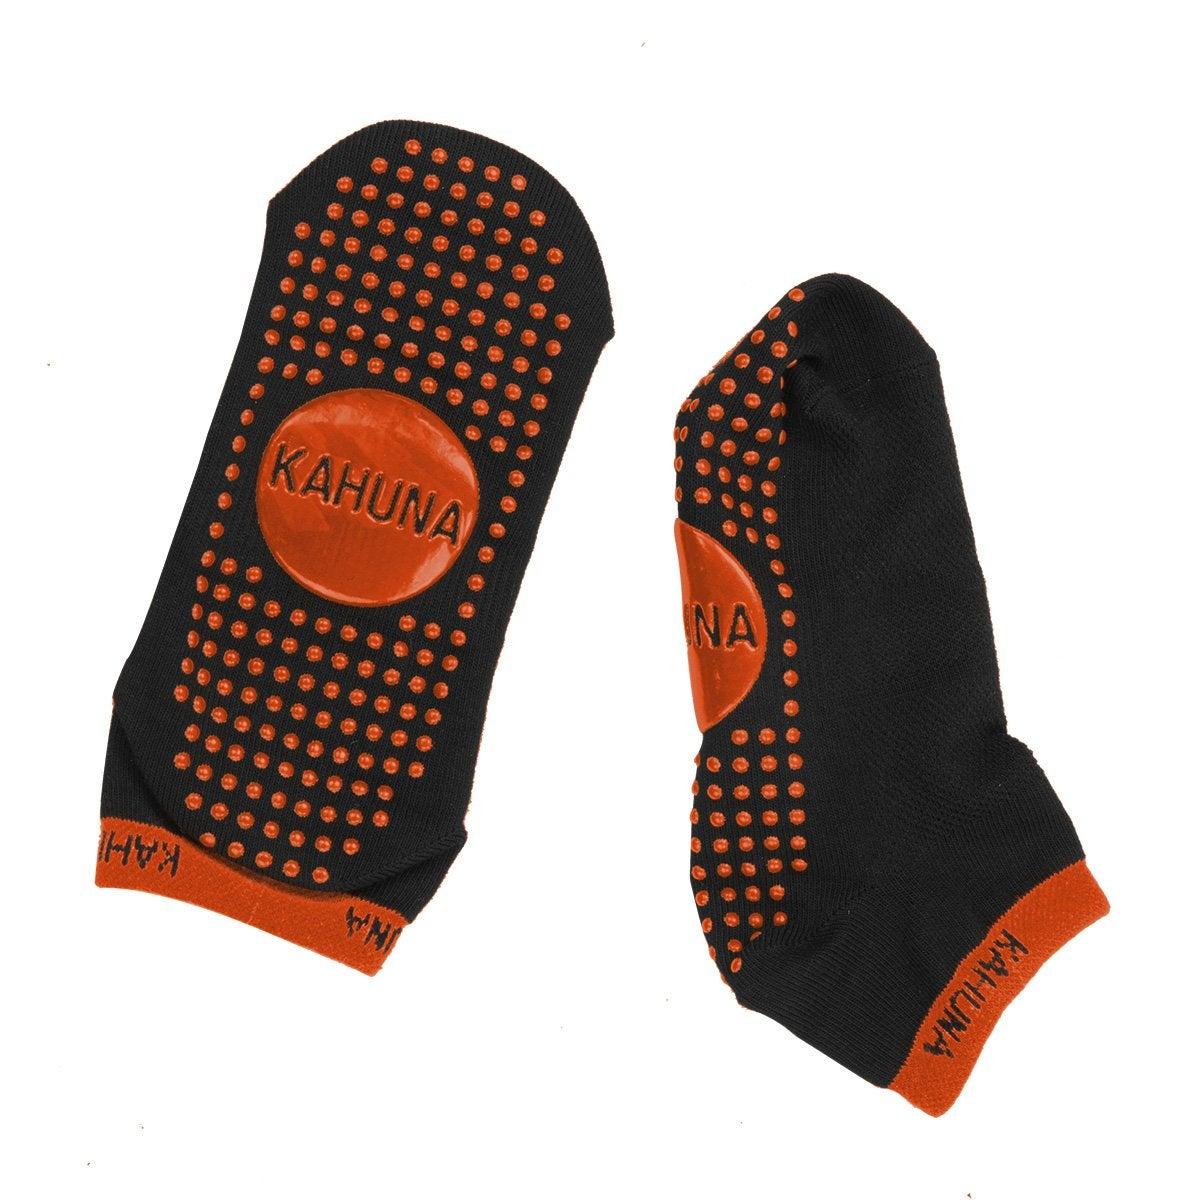 Kahuna Trampoline Kids Safety Anti-Slip Socks Pair- Medium